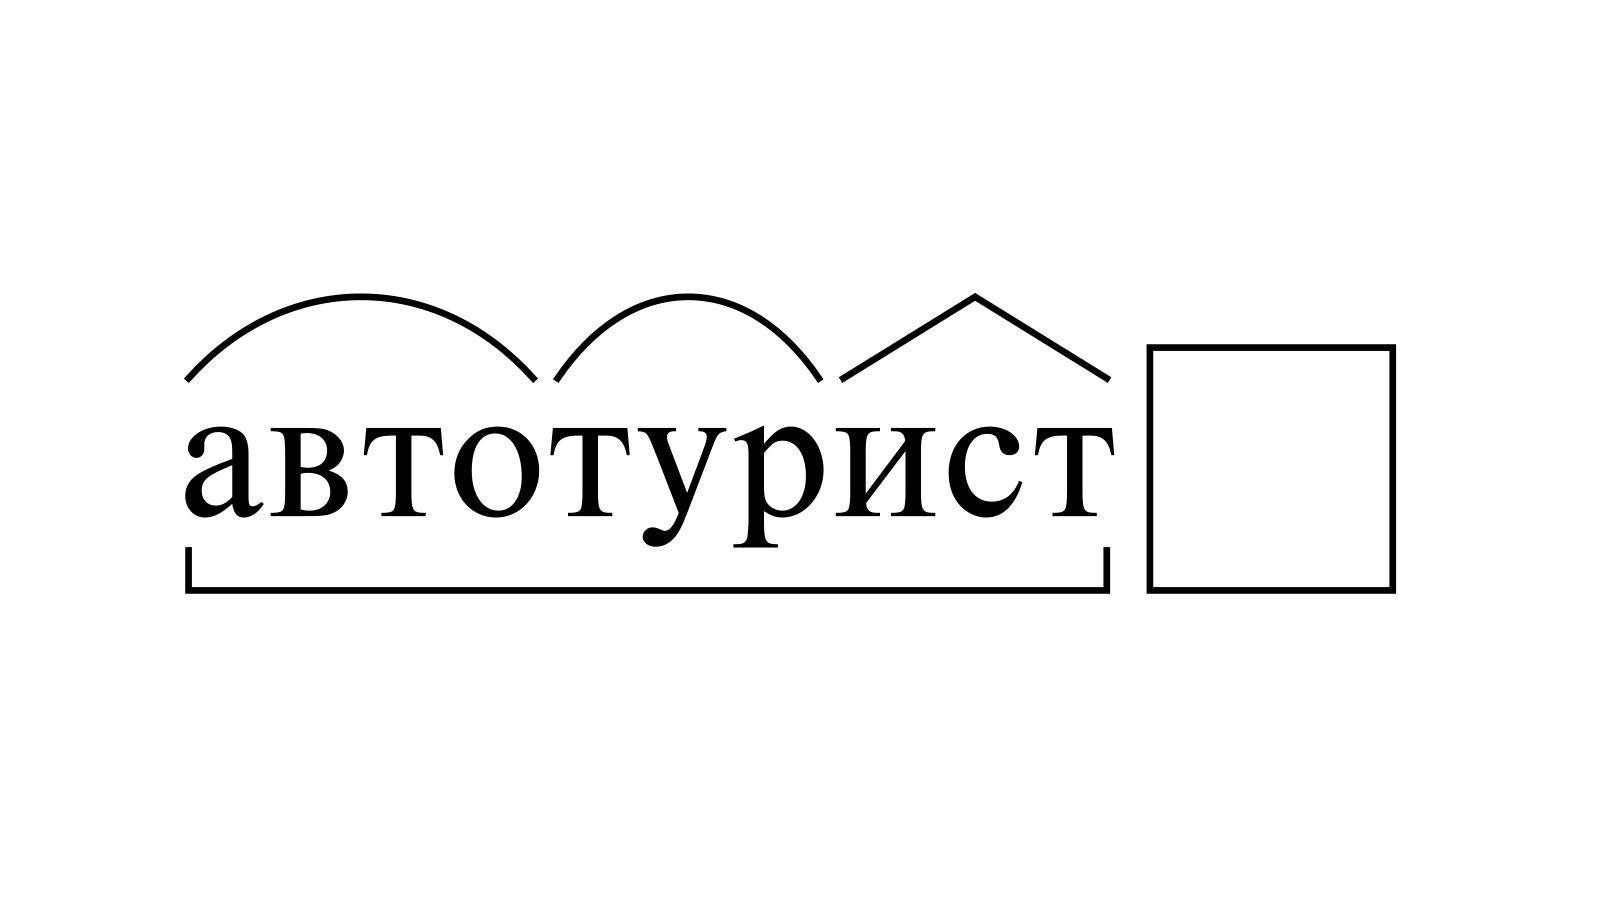 Разбор слова «автотурист» по составу